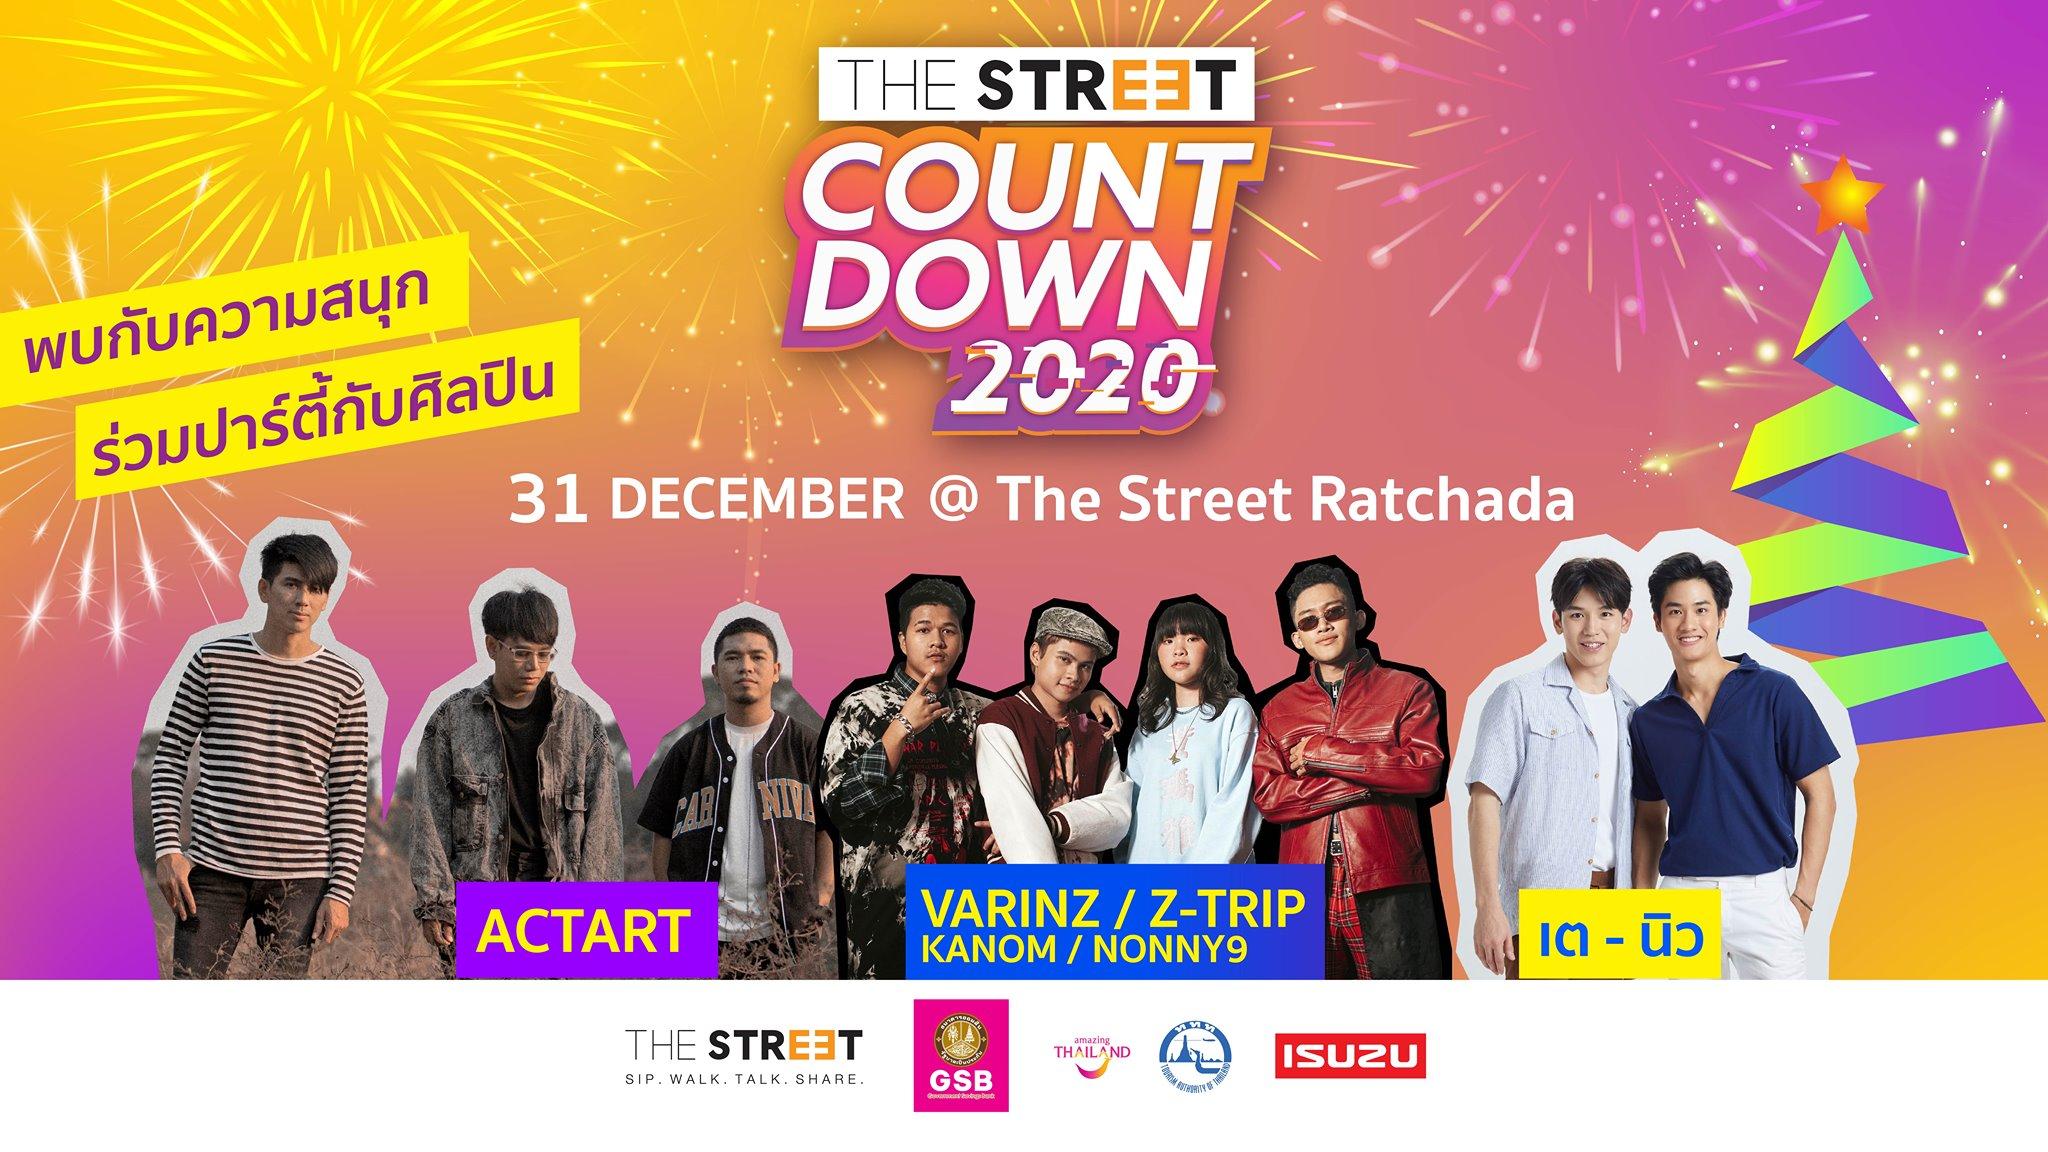 The Street Countdown 2020